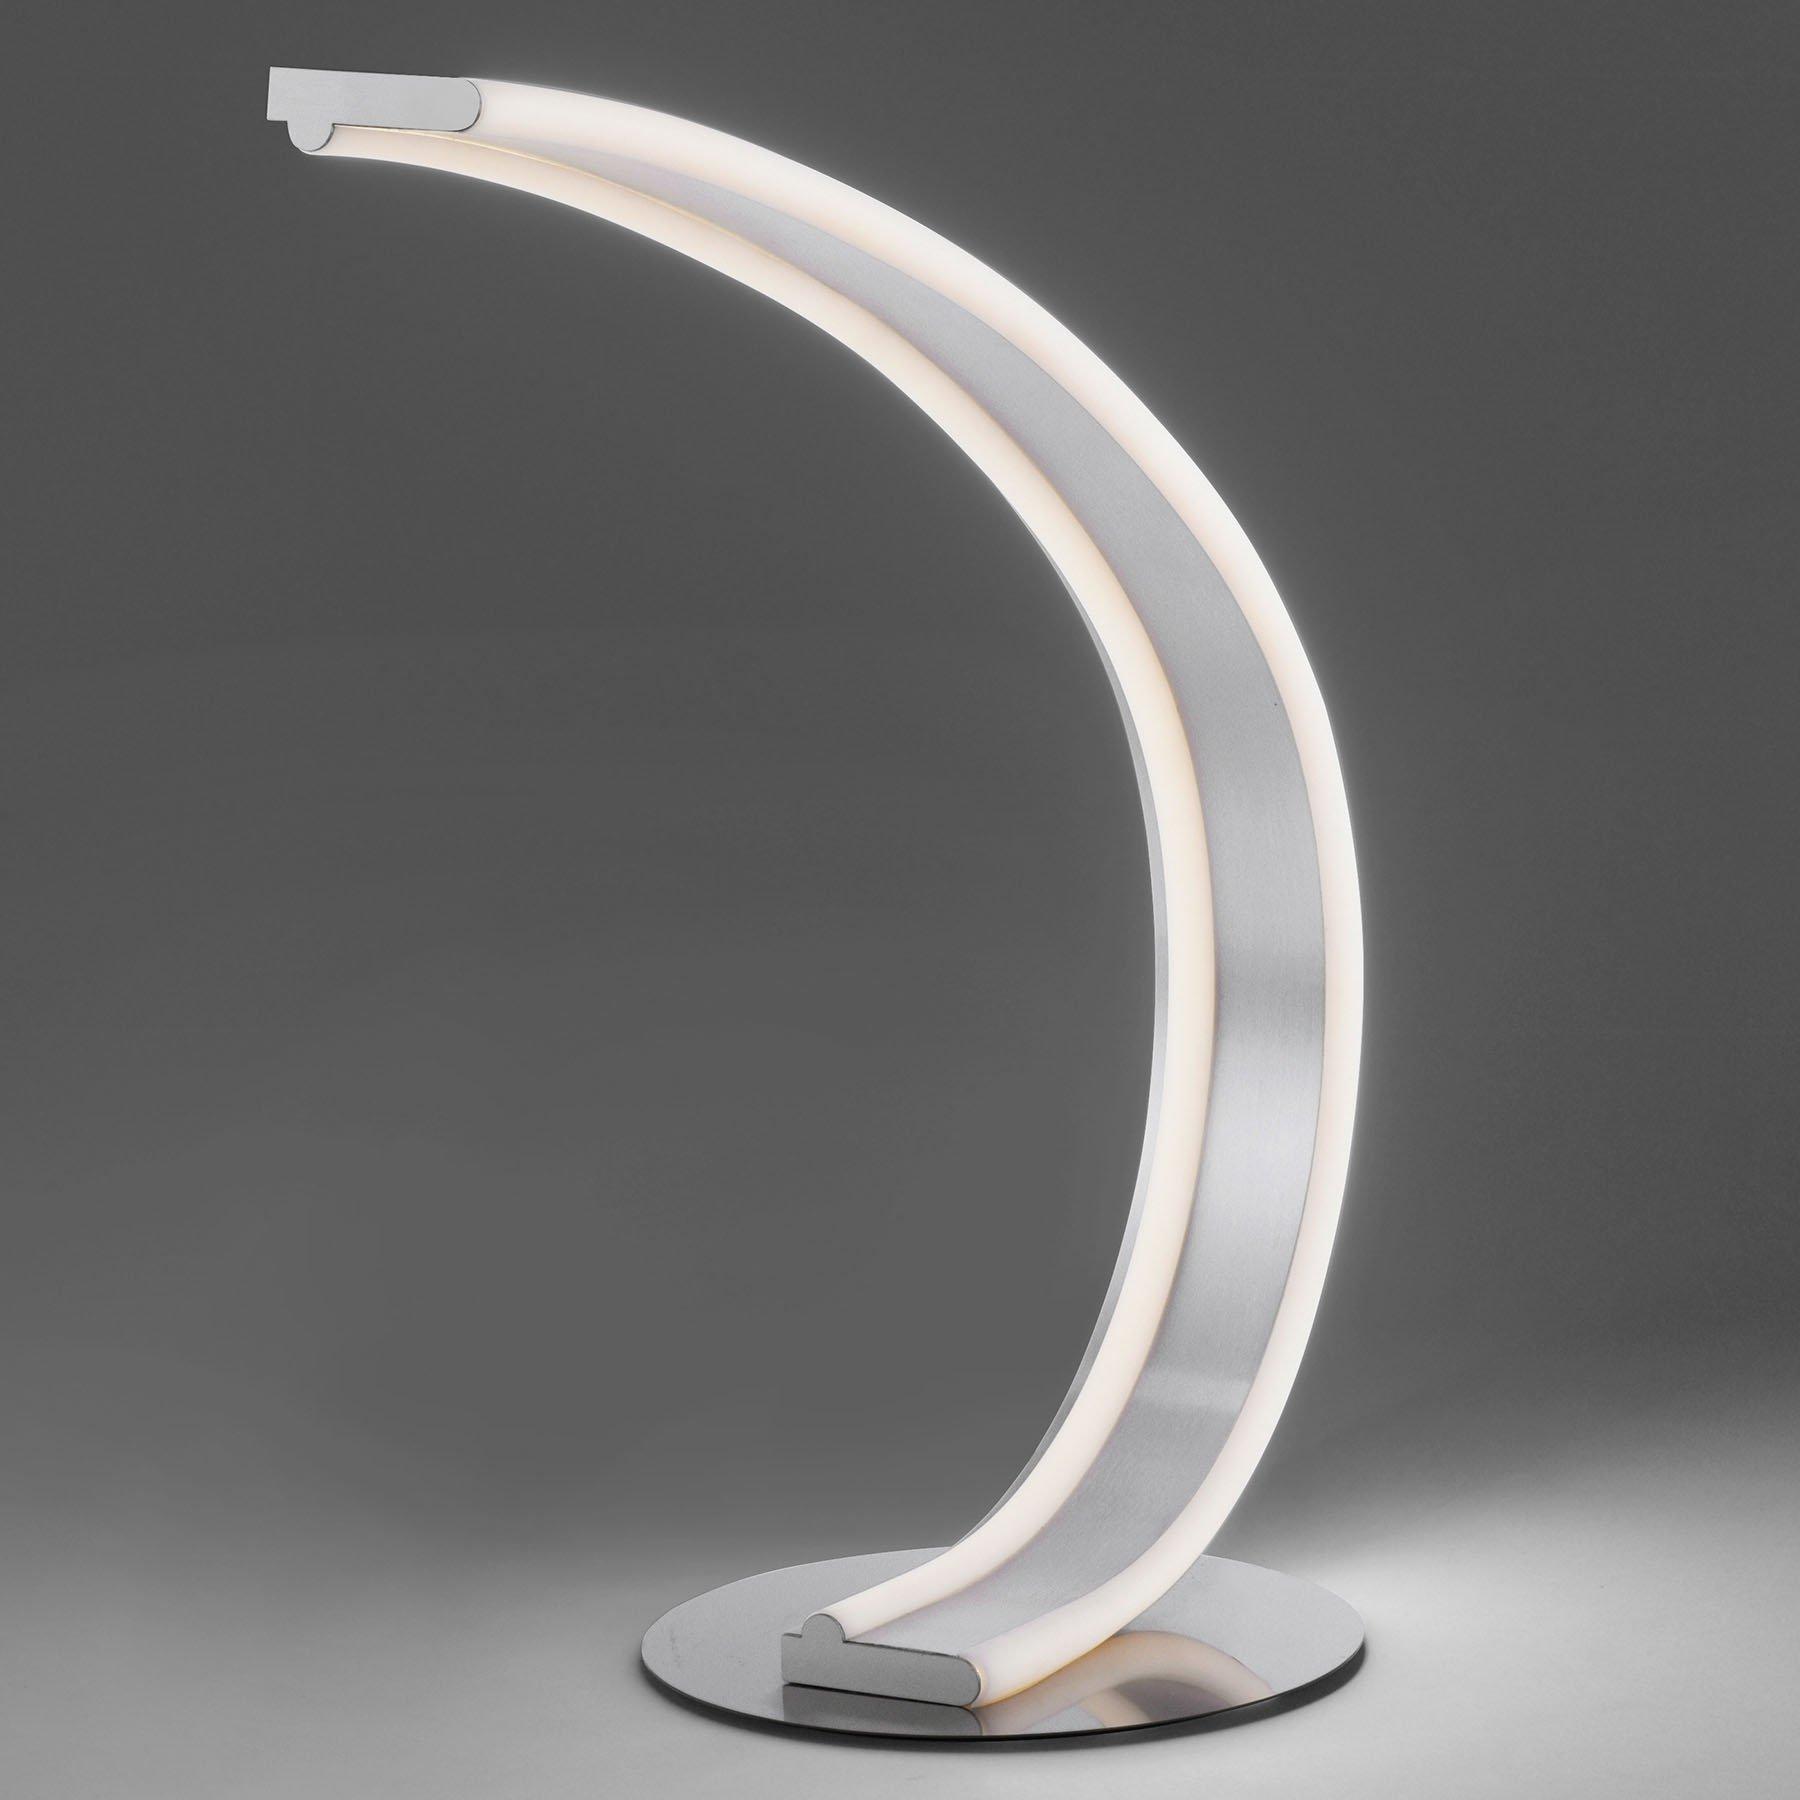 Paul Neuhaus Q-VITO LED-bordlampe